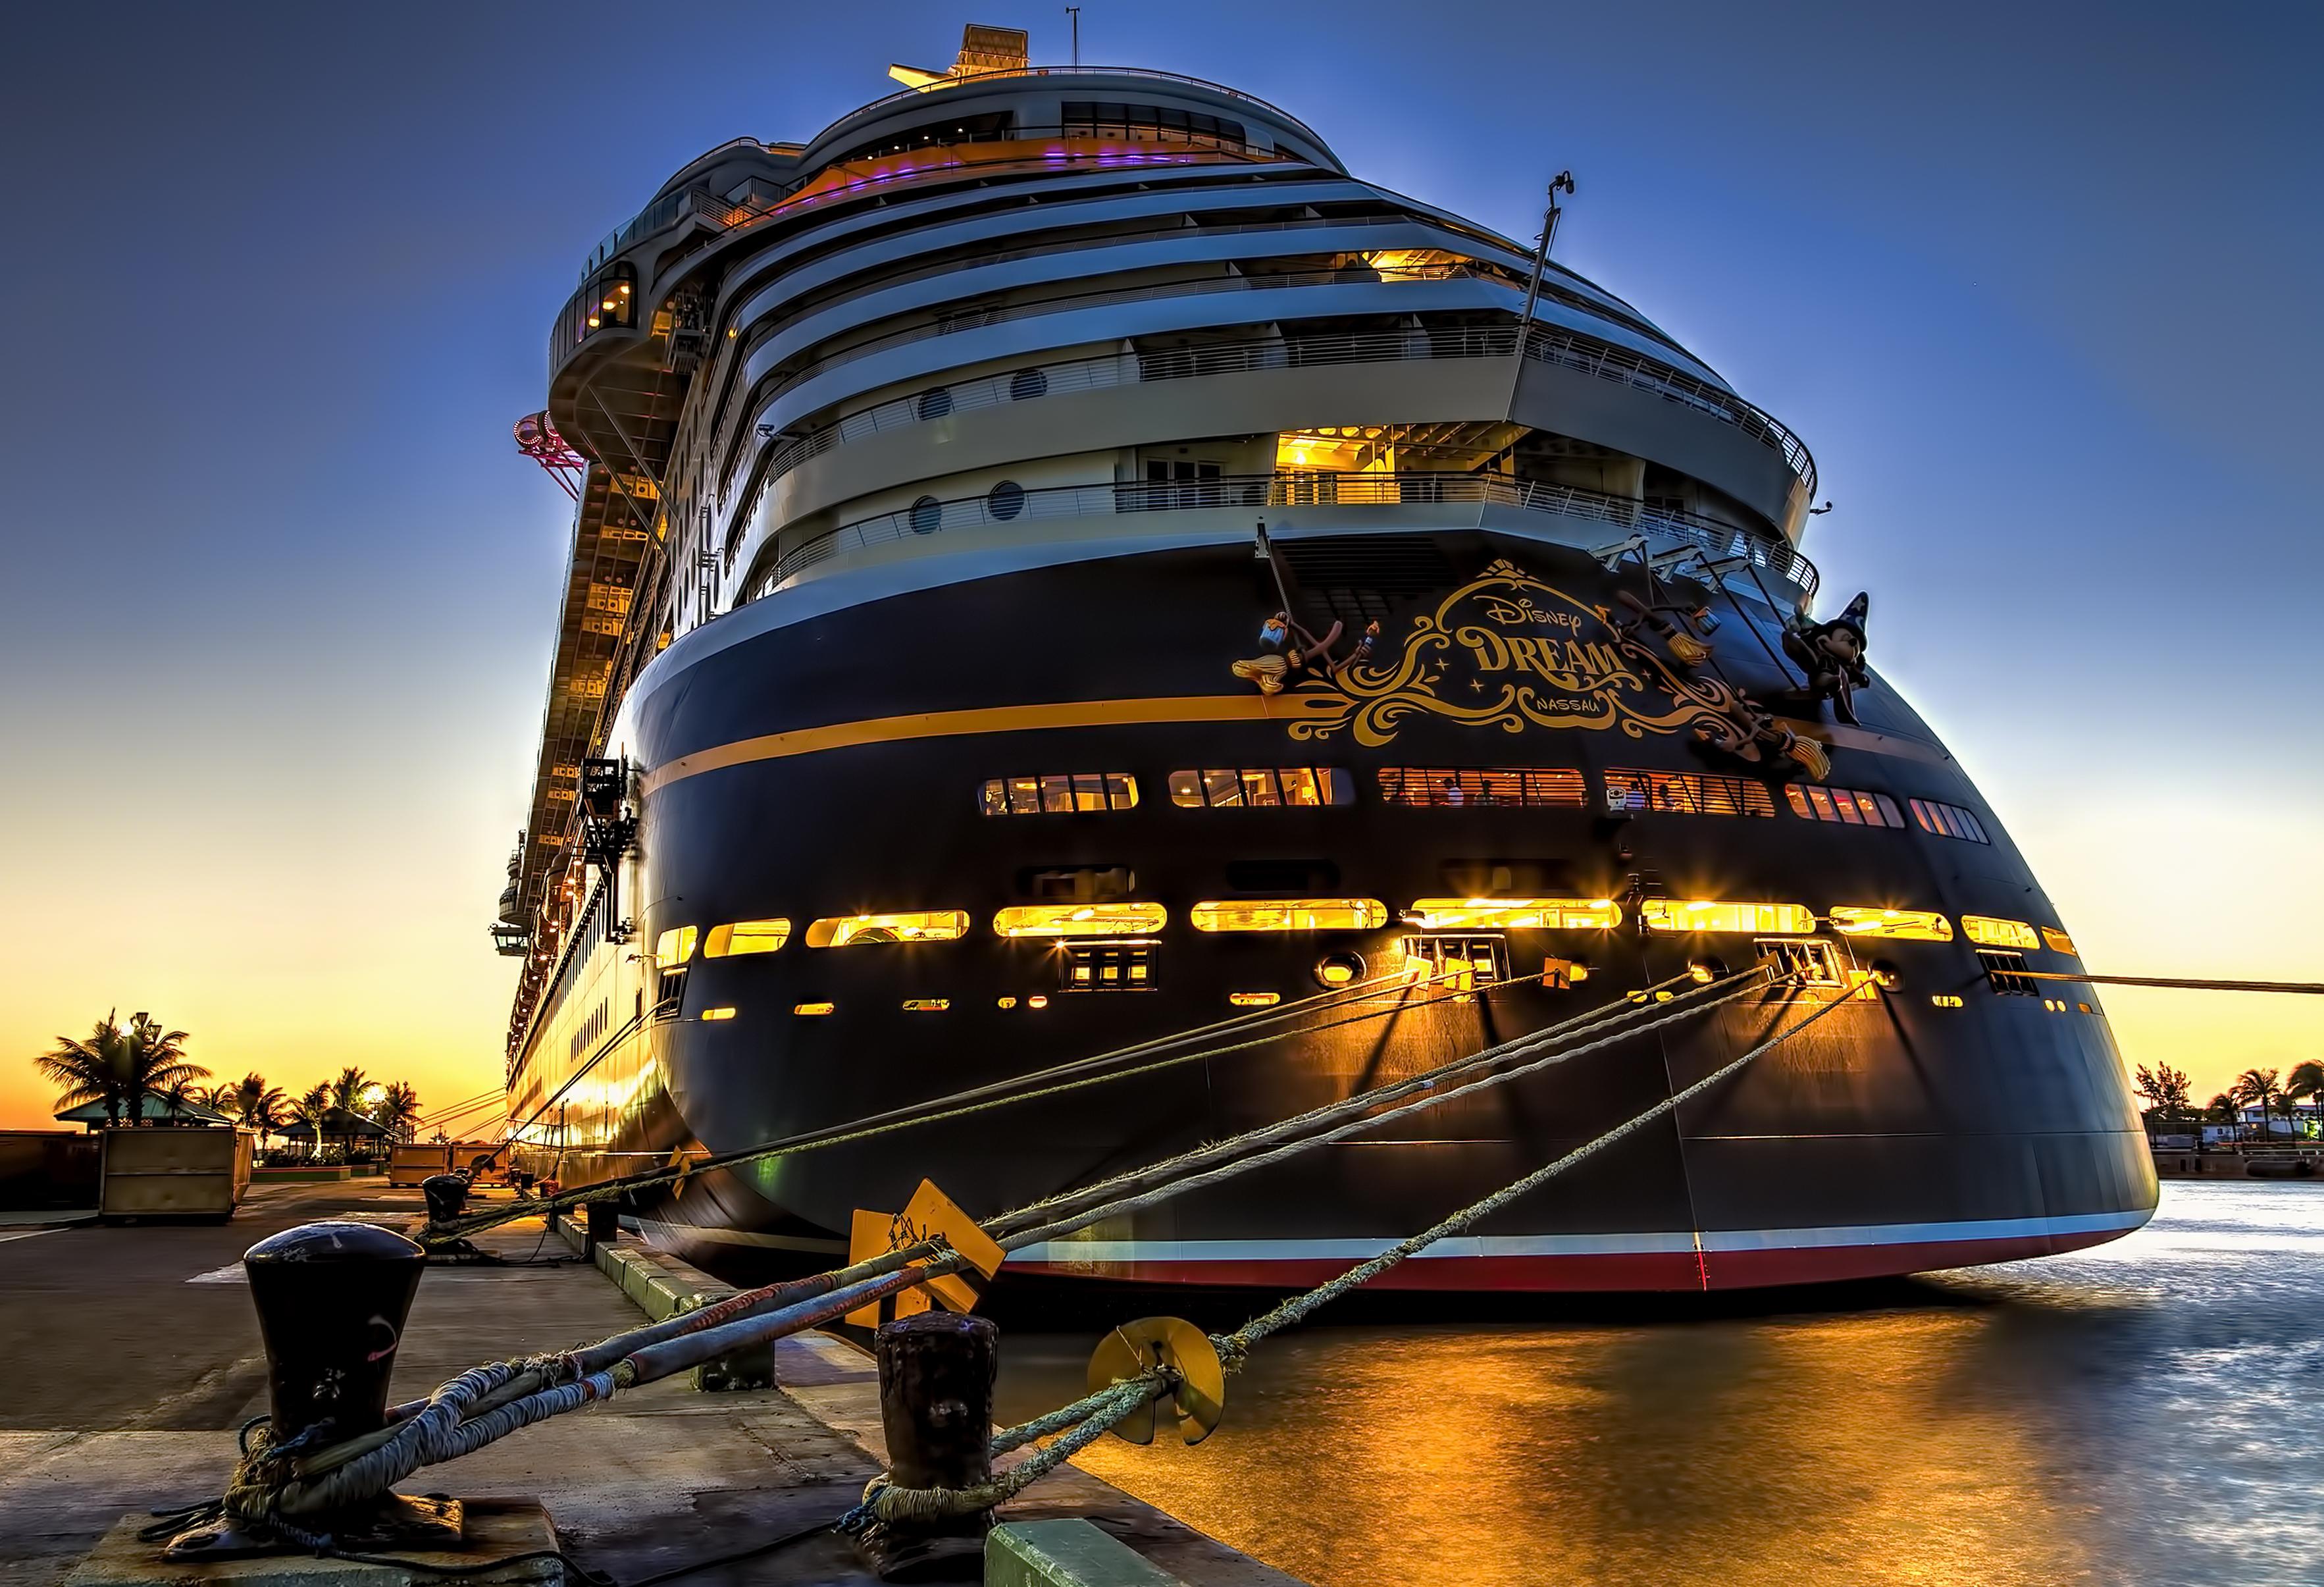 Wallpaper Ocean Voyage Park Cruise Blue Sunset Sea